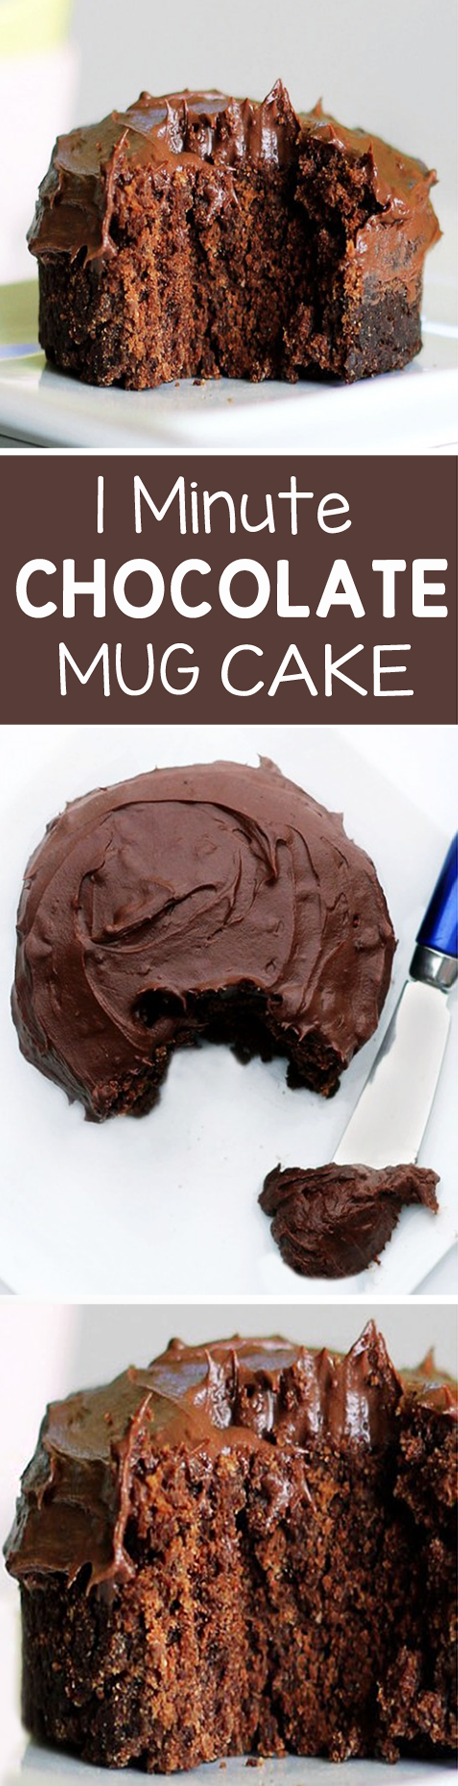 1 Minute Chocolate Cake In A Mug!